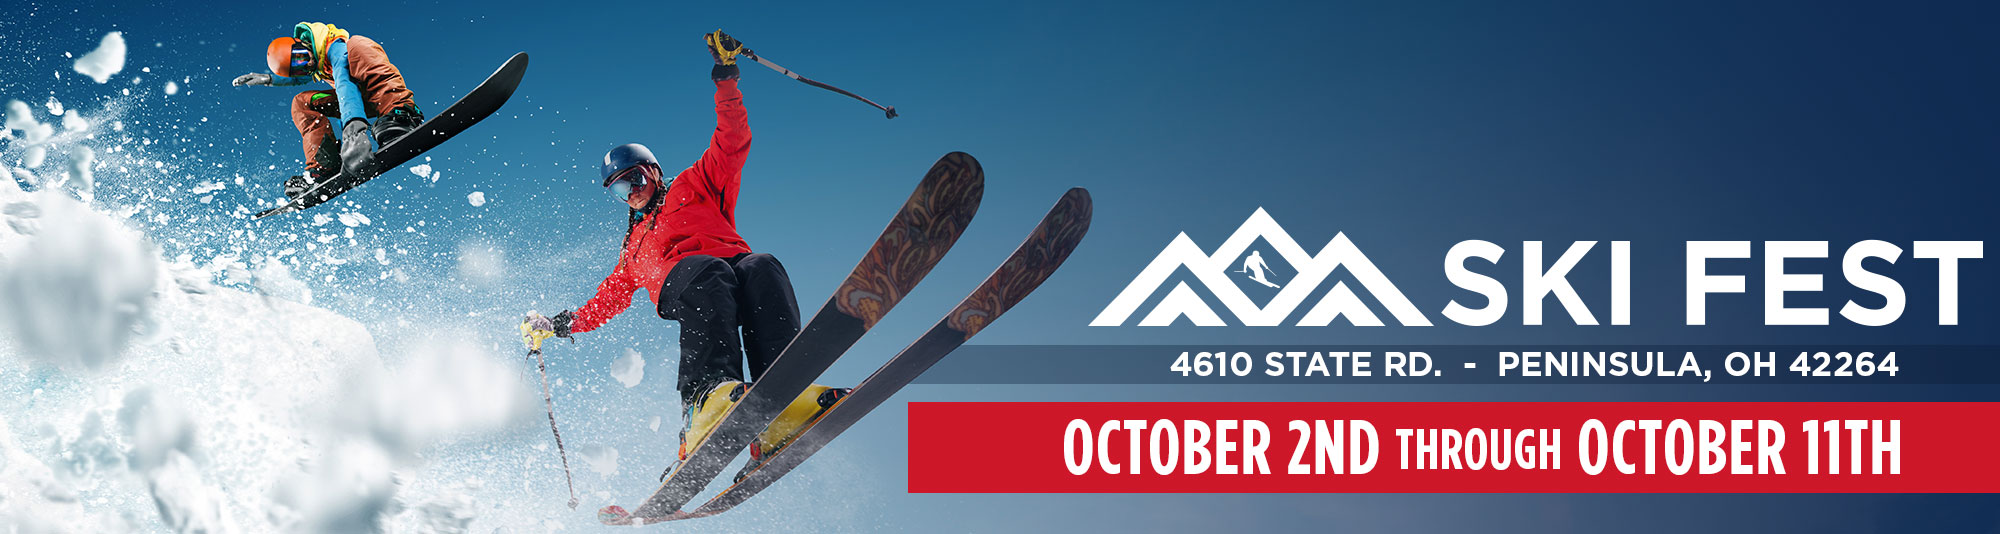 2020 Ski Fest at Buckeye Sports Center Friday October 2nd through Sunday October 11th